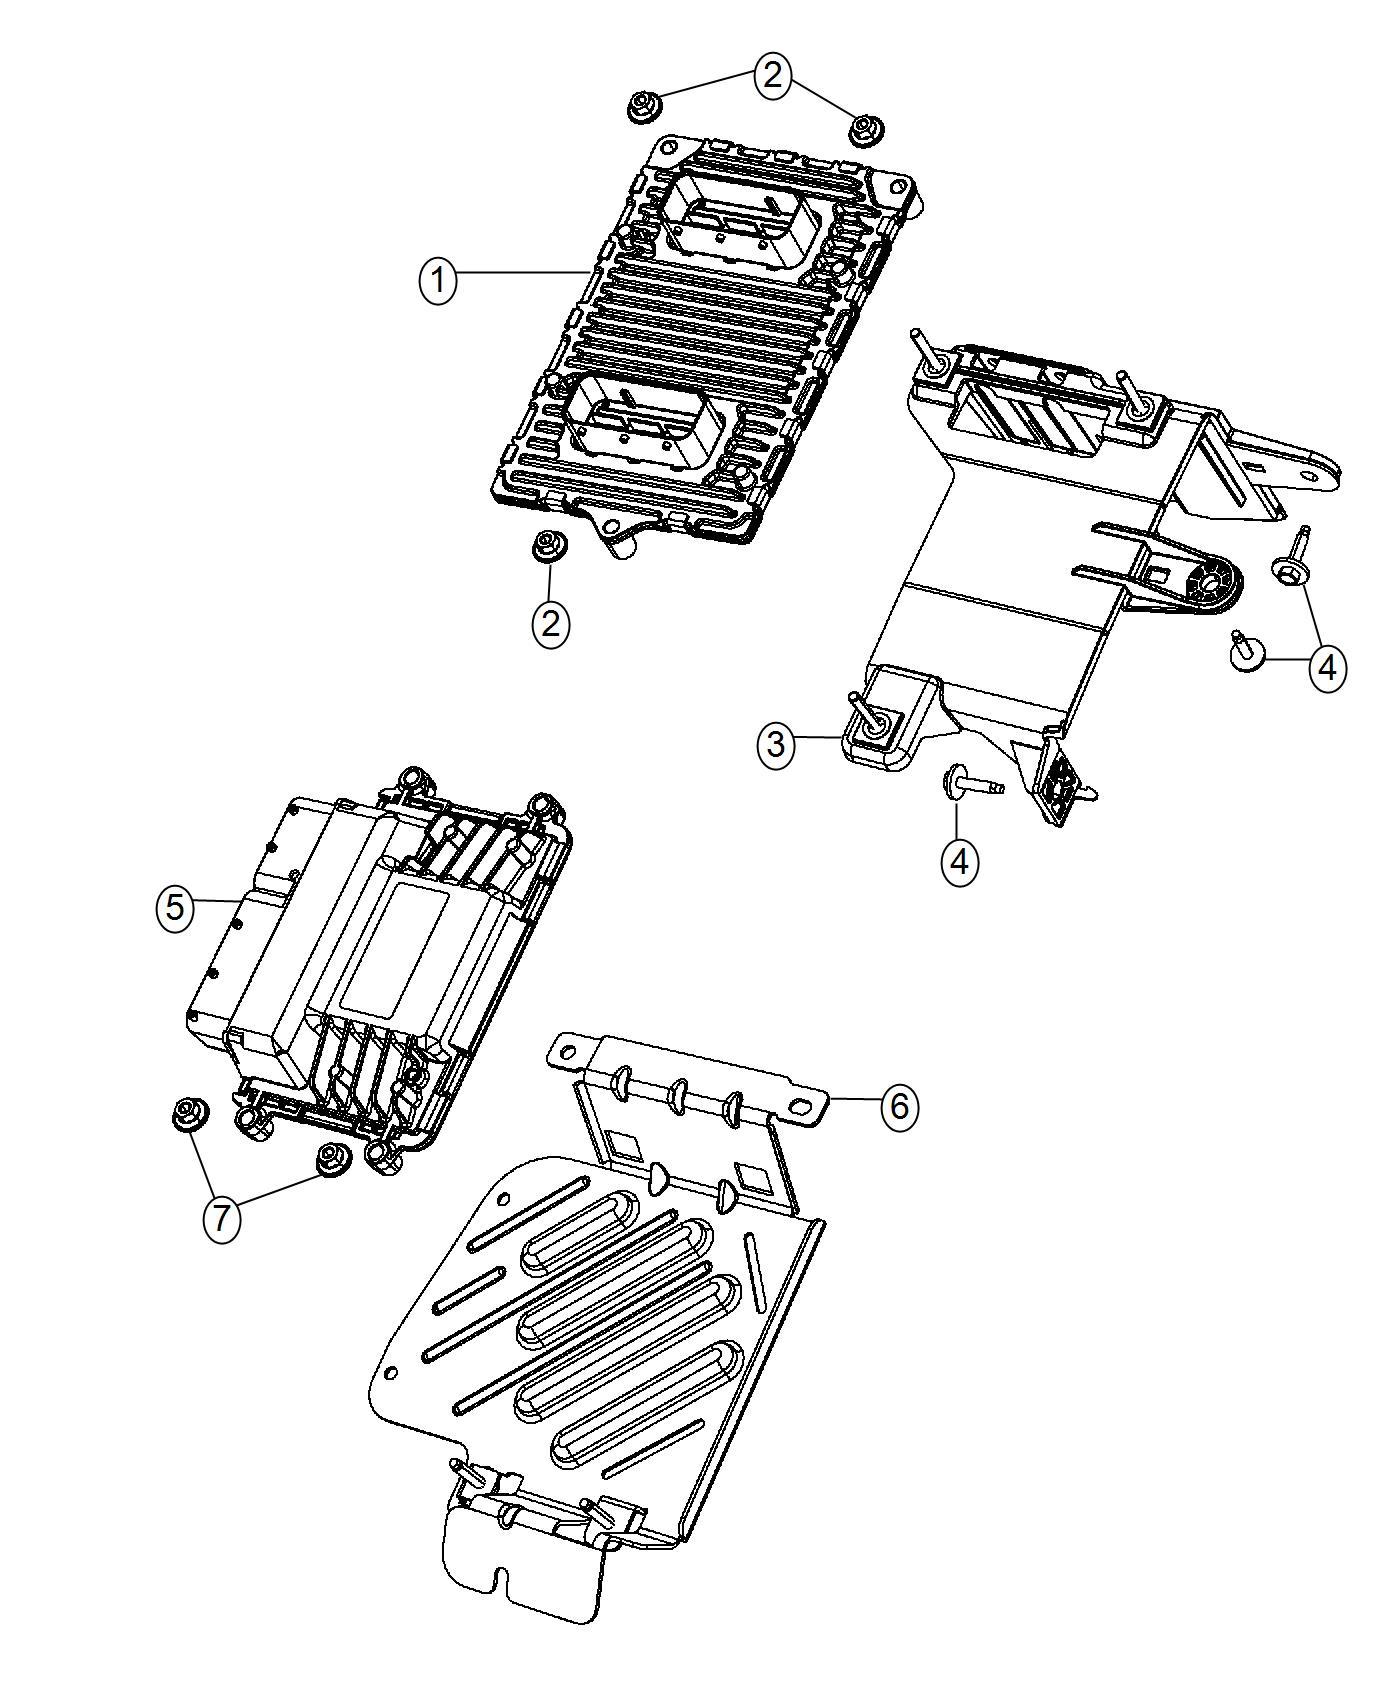 2015 Dodge Dart Module. Transmission control. [dmd